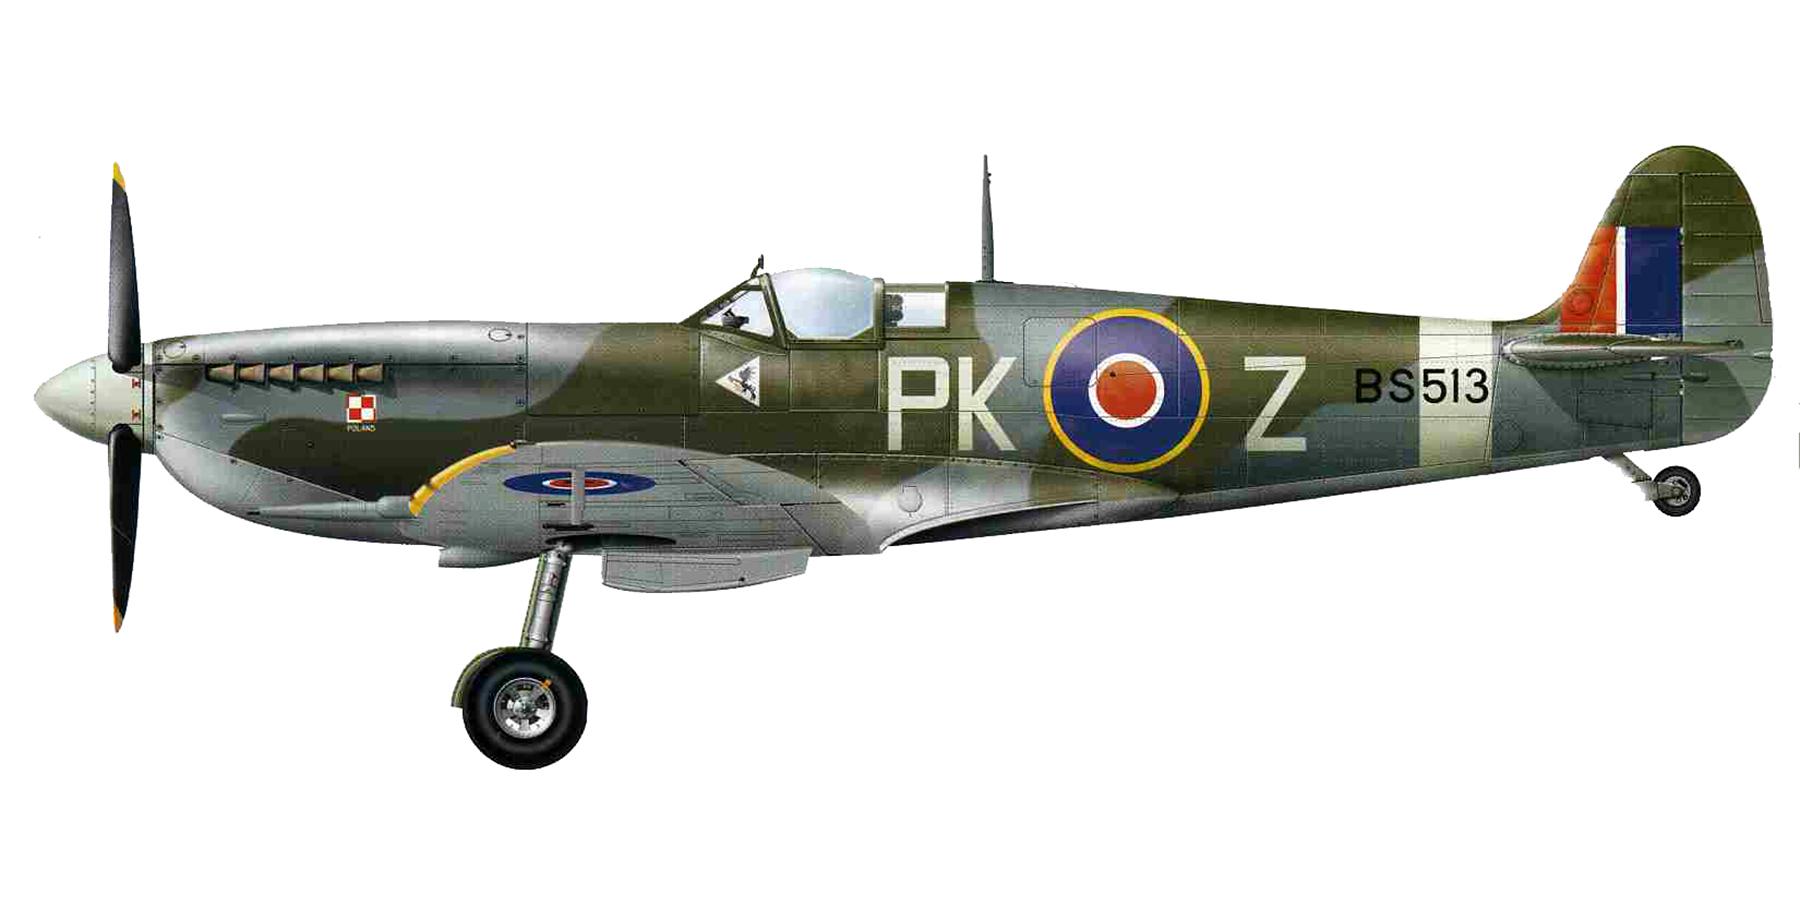 Spitfire MkIX RAF 315Sqn PKZ BS513 1943 0A